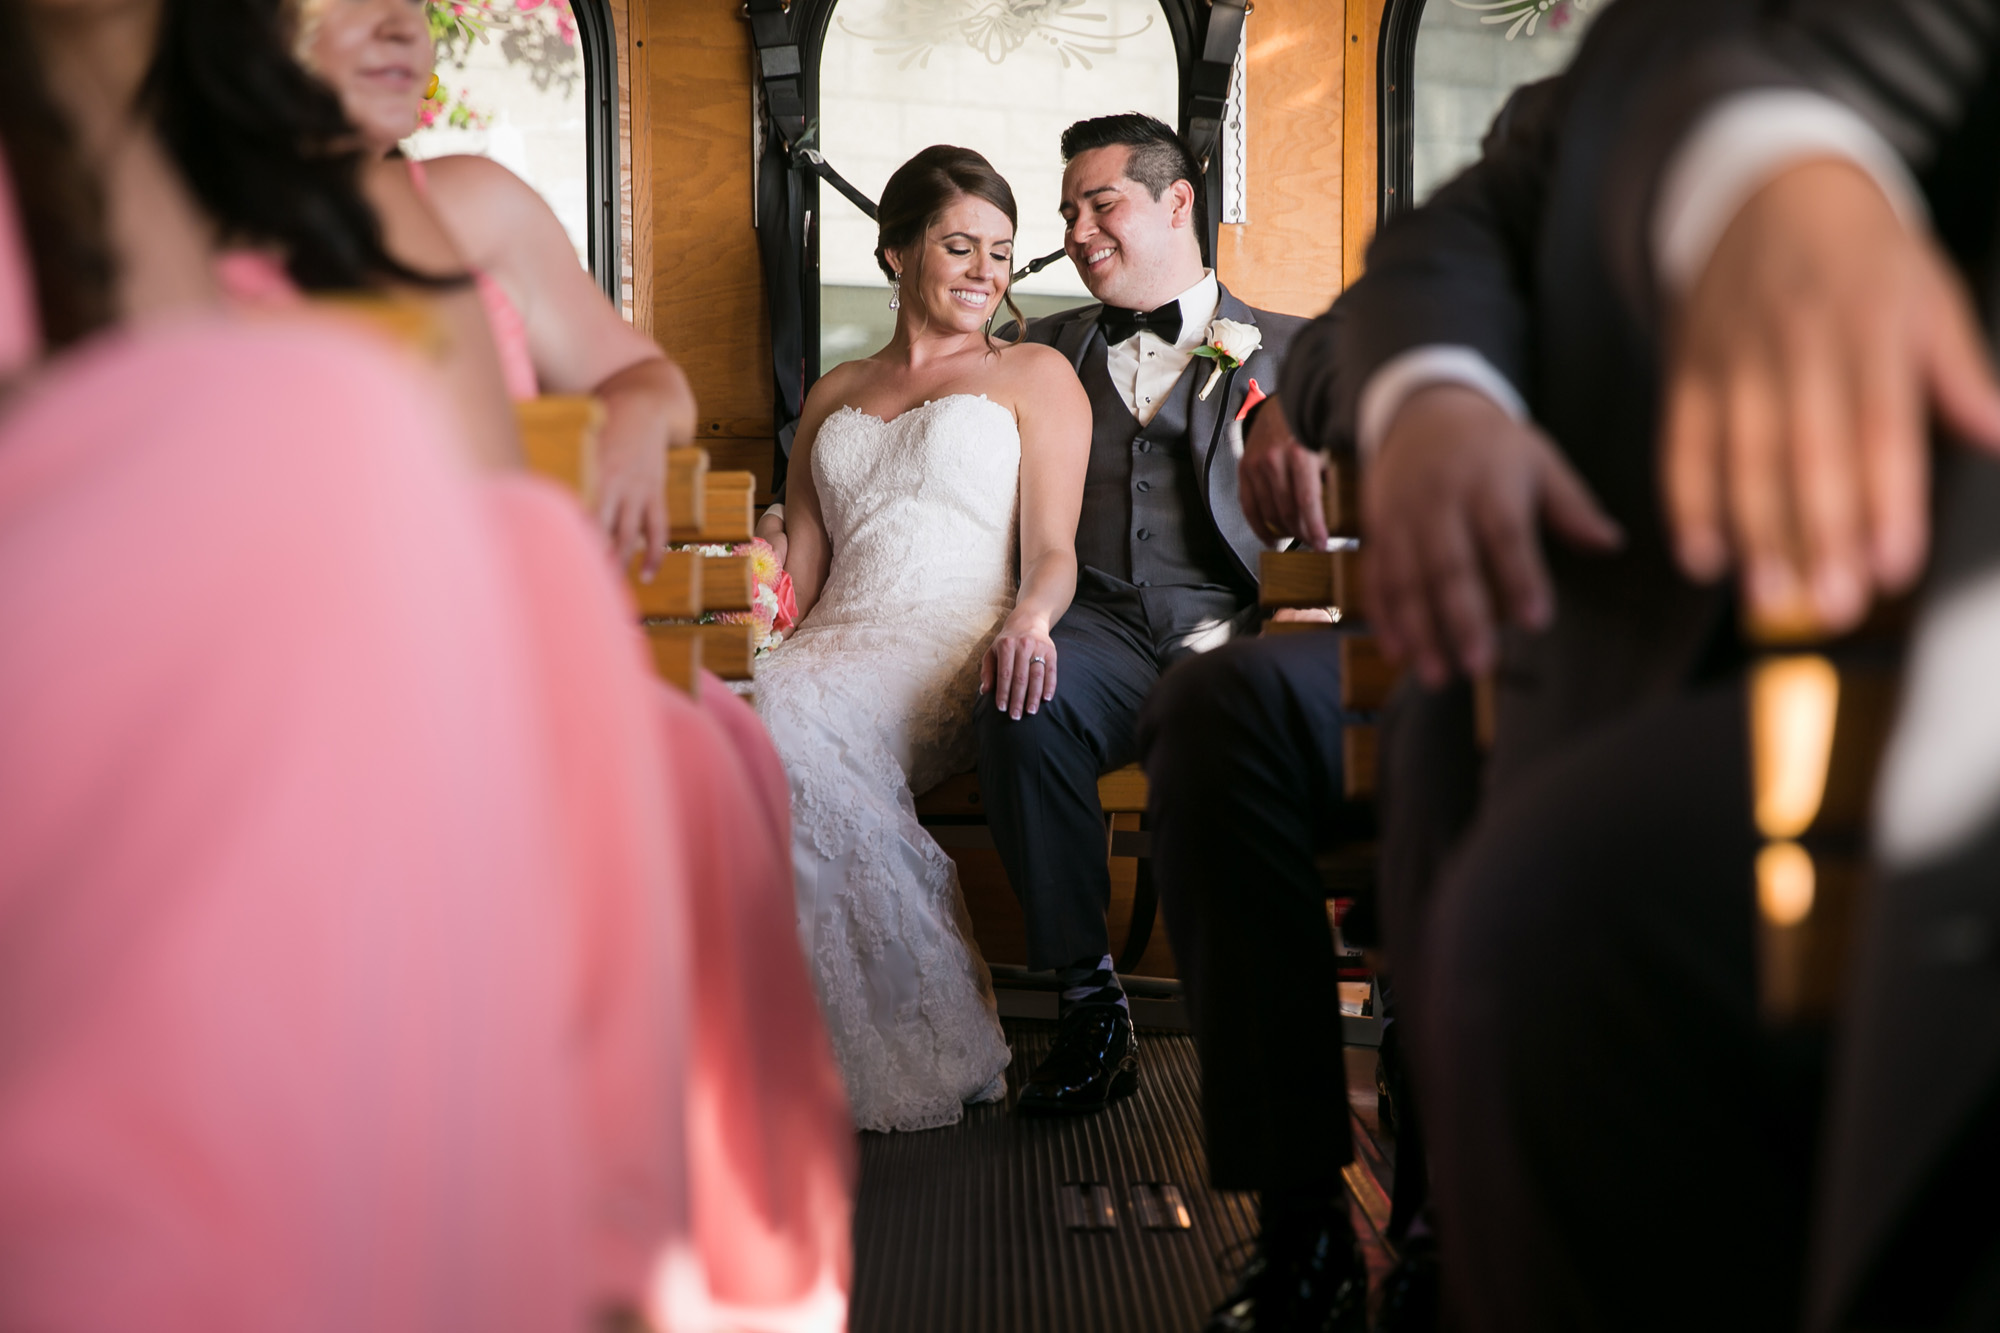 Geoff Kowalchuk BM Wedding Photography-016.jpg